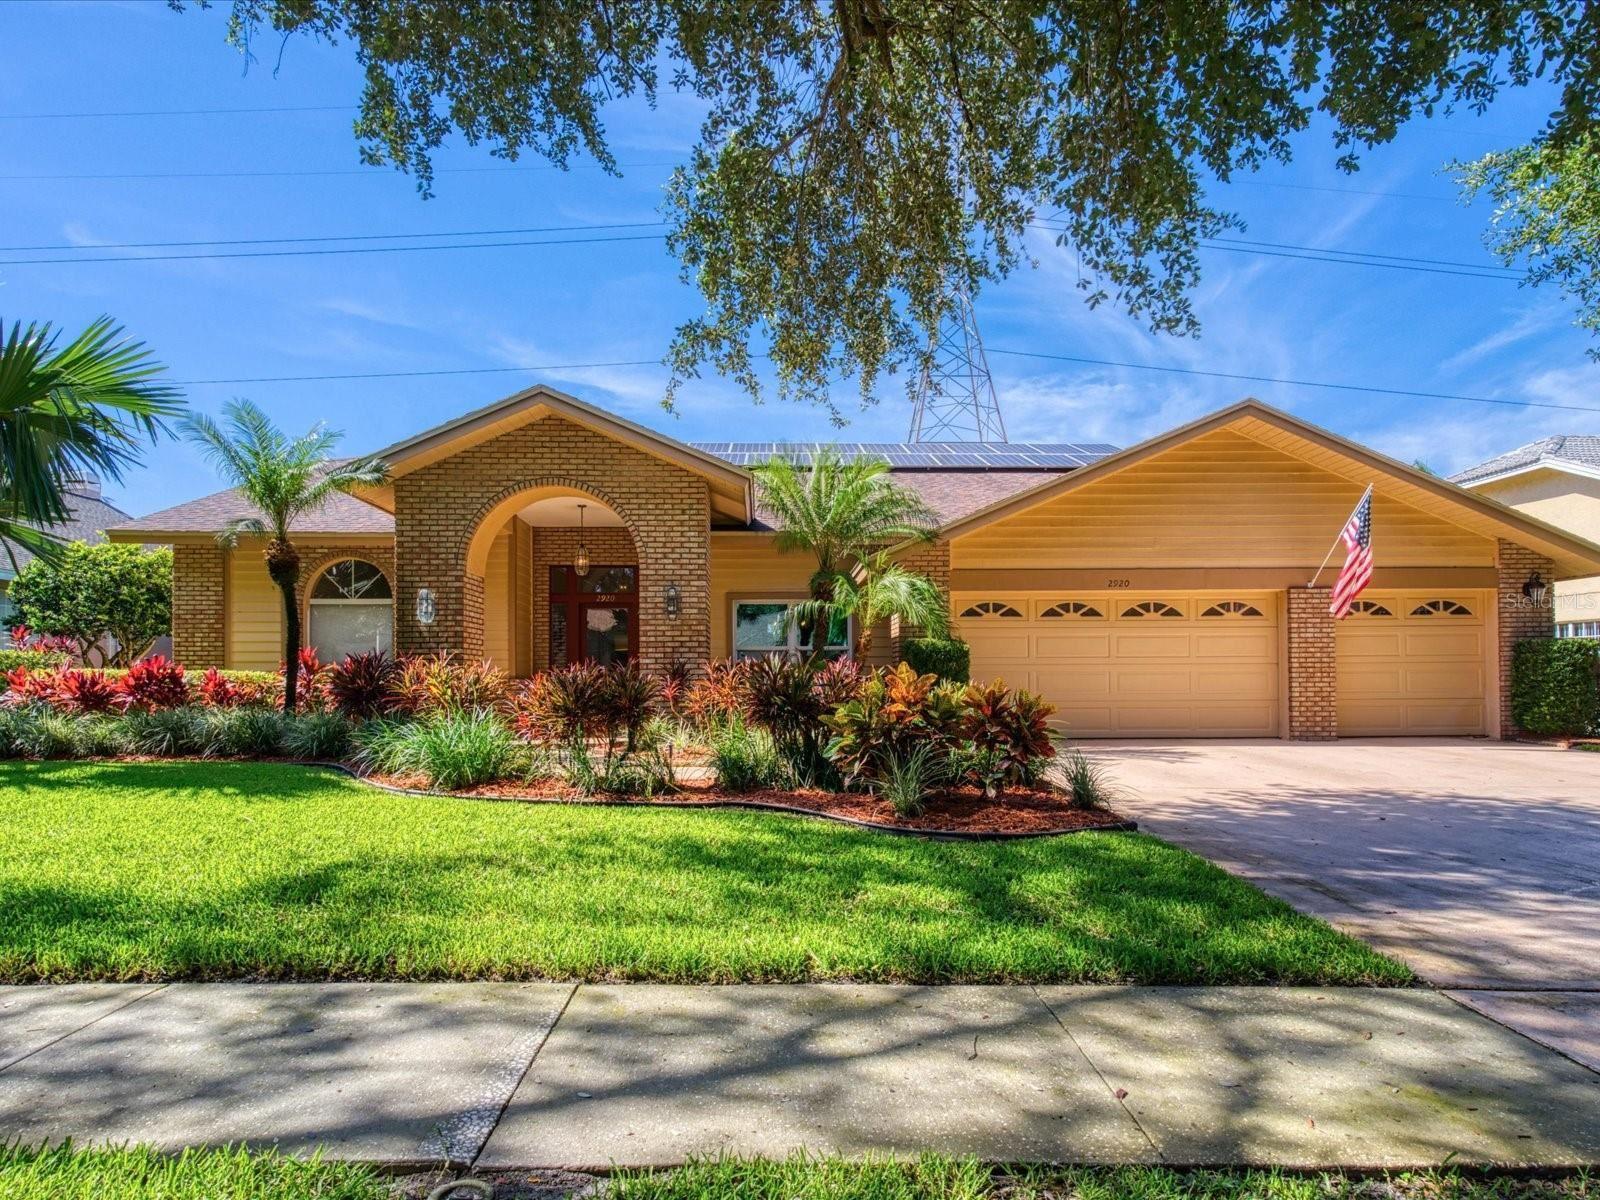 2920 CHANCERY LANE, Clearwater, FL 33759 - #: U8131136